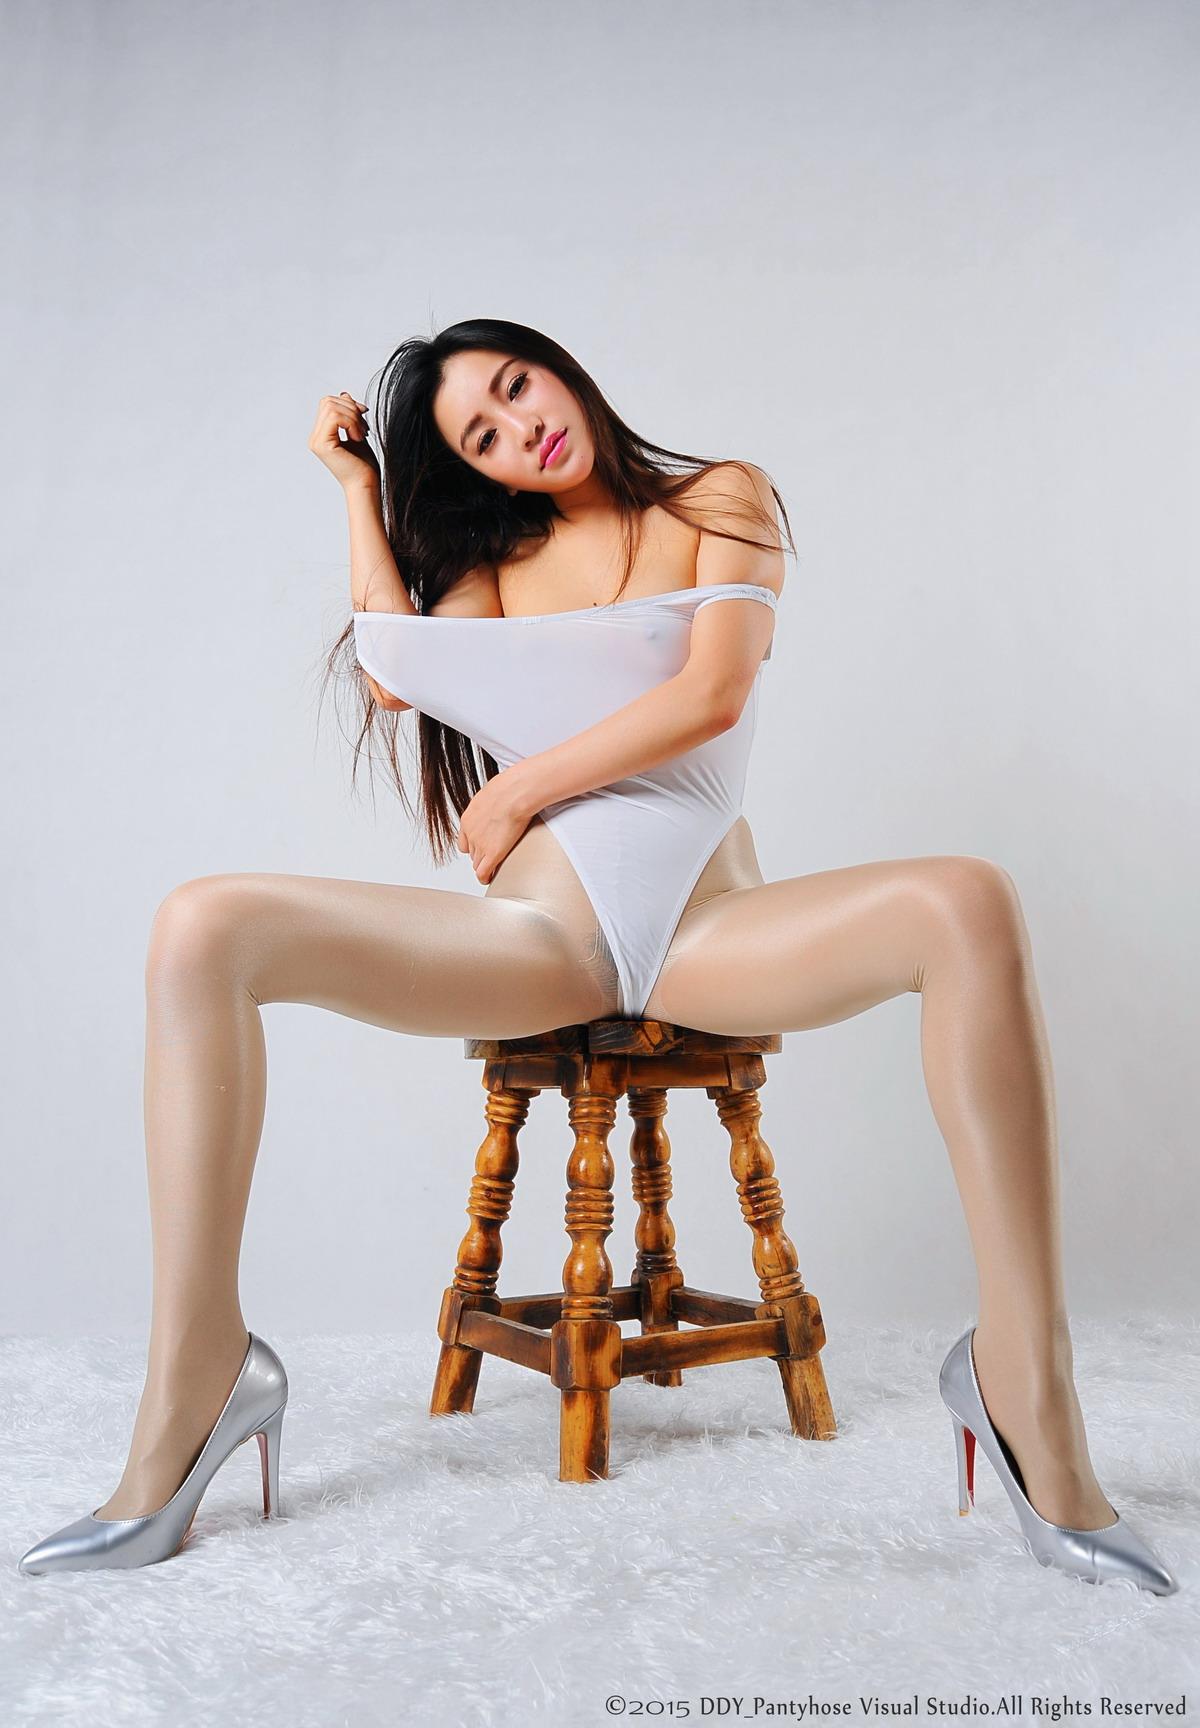 [DDY_PantyhoseArt]原创丝袜美腿 NO.002-Preview[/225MB]